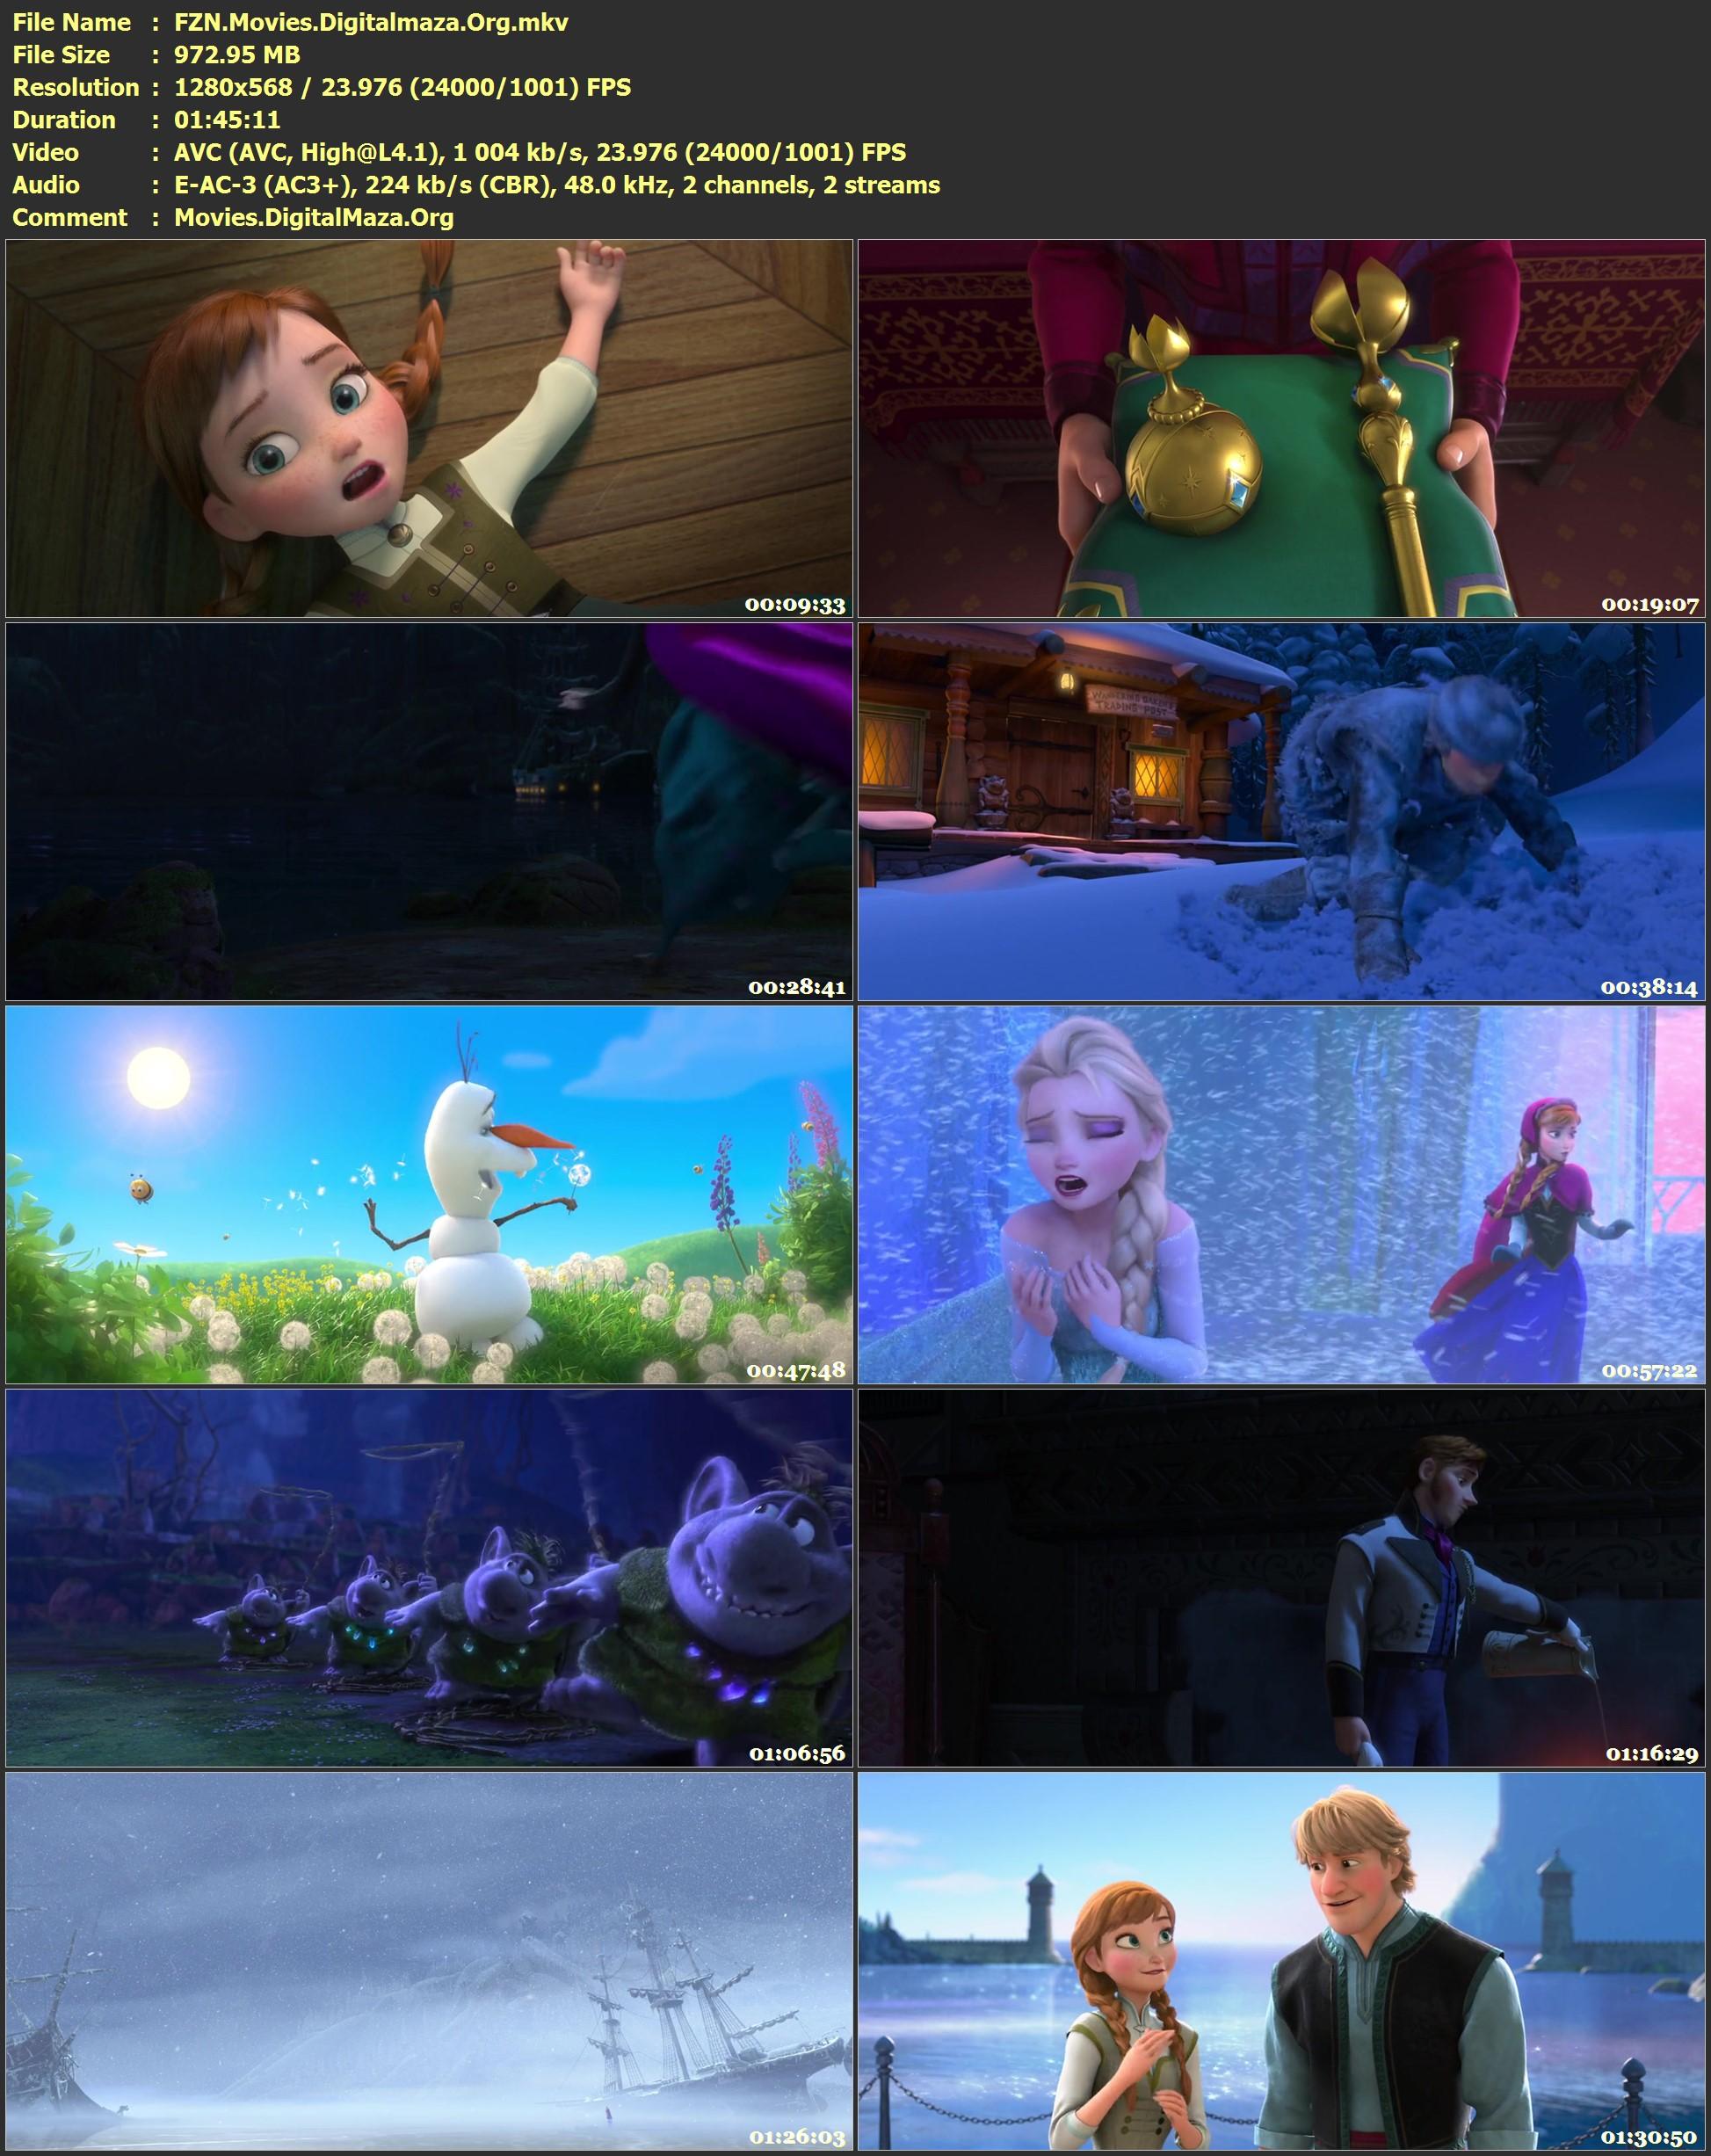 https://image.ibb.co/ivw5Q7/FZN_Movies_Digitalmaza_Org_mkv.jpg